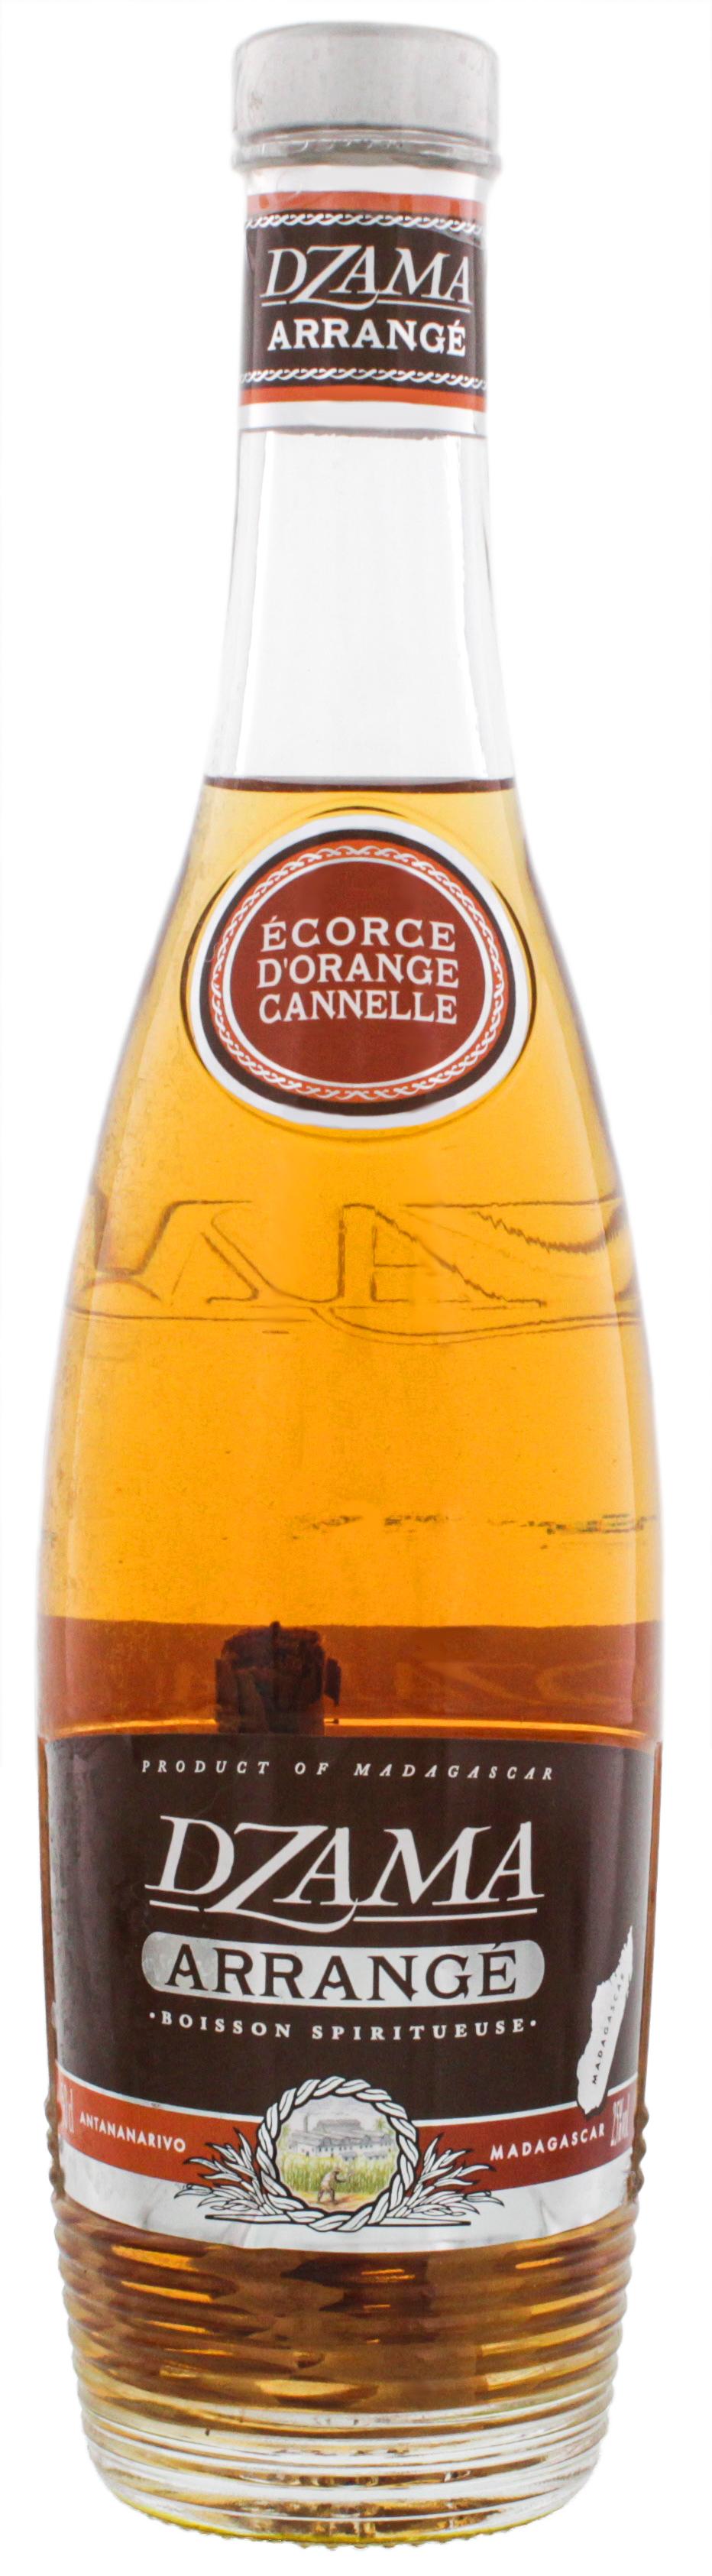 Dzama Arrange Ecorce dOrange Cannelle 0,5L